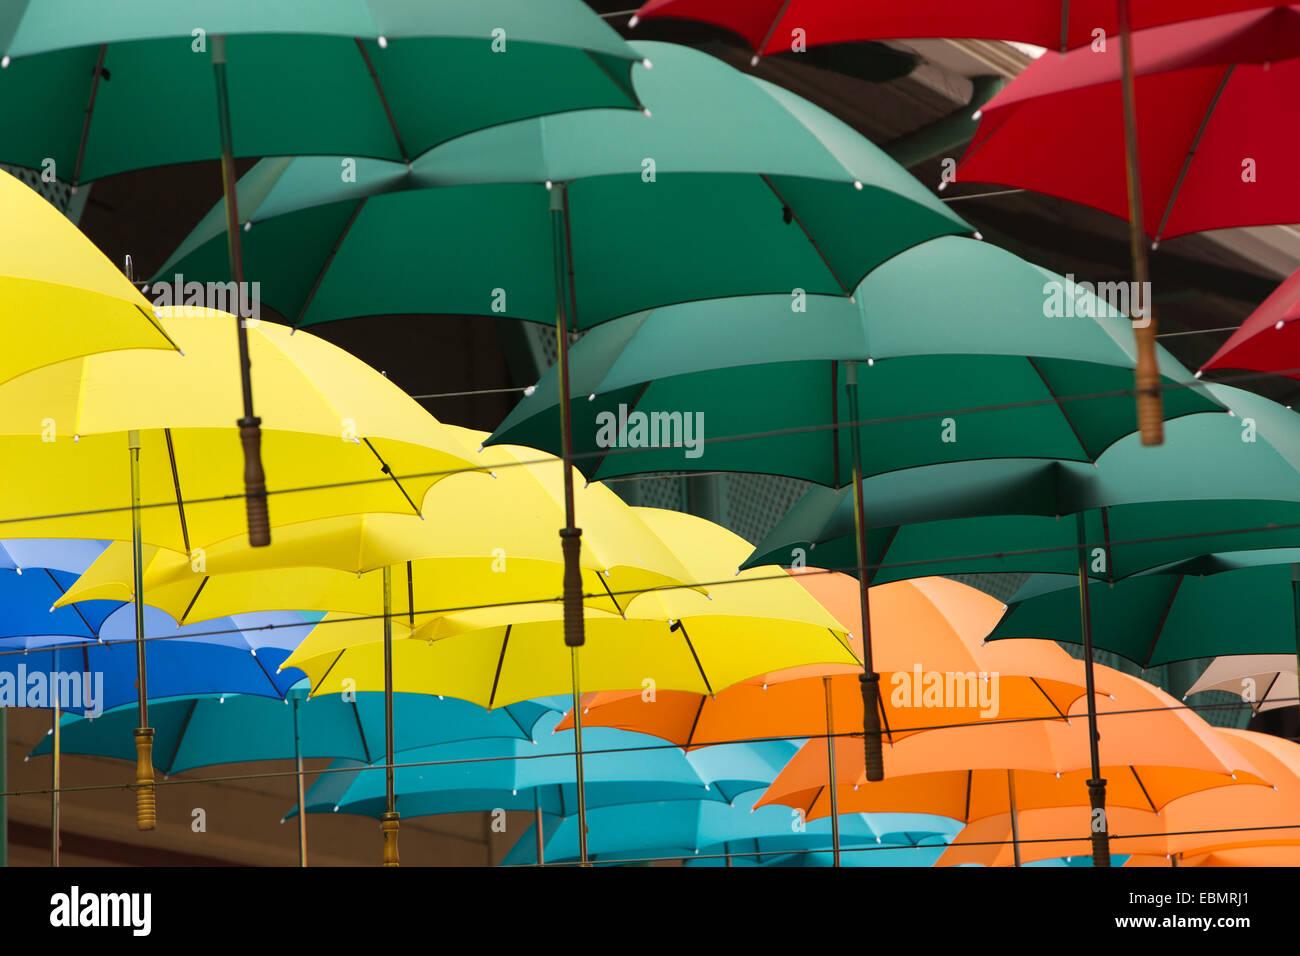 Mauritius, Port Louis, Caudon Wasser, bunte Beschattung Schirme installation Stockbild